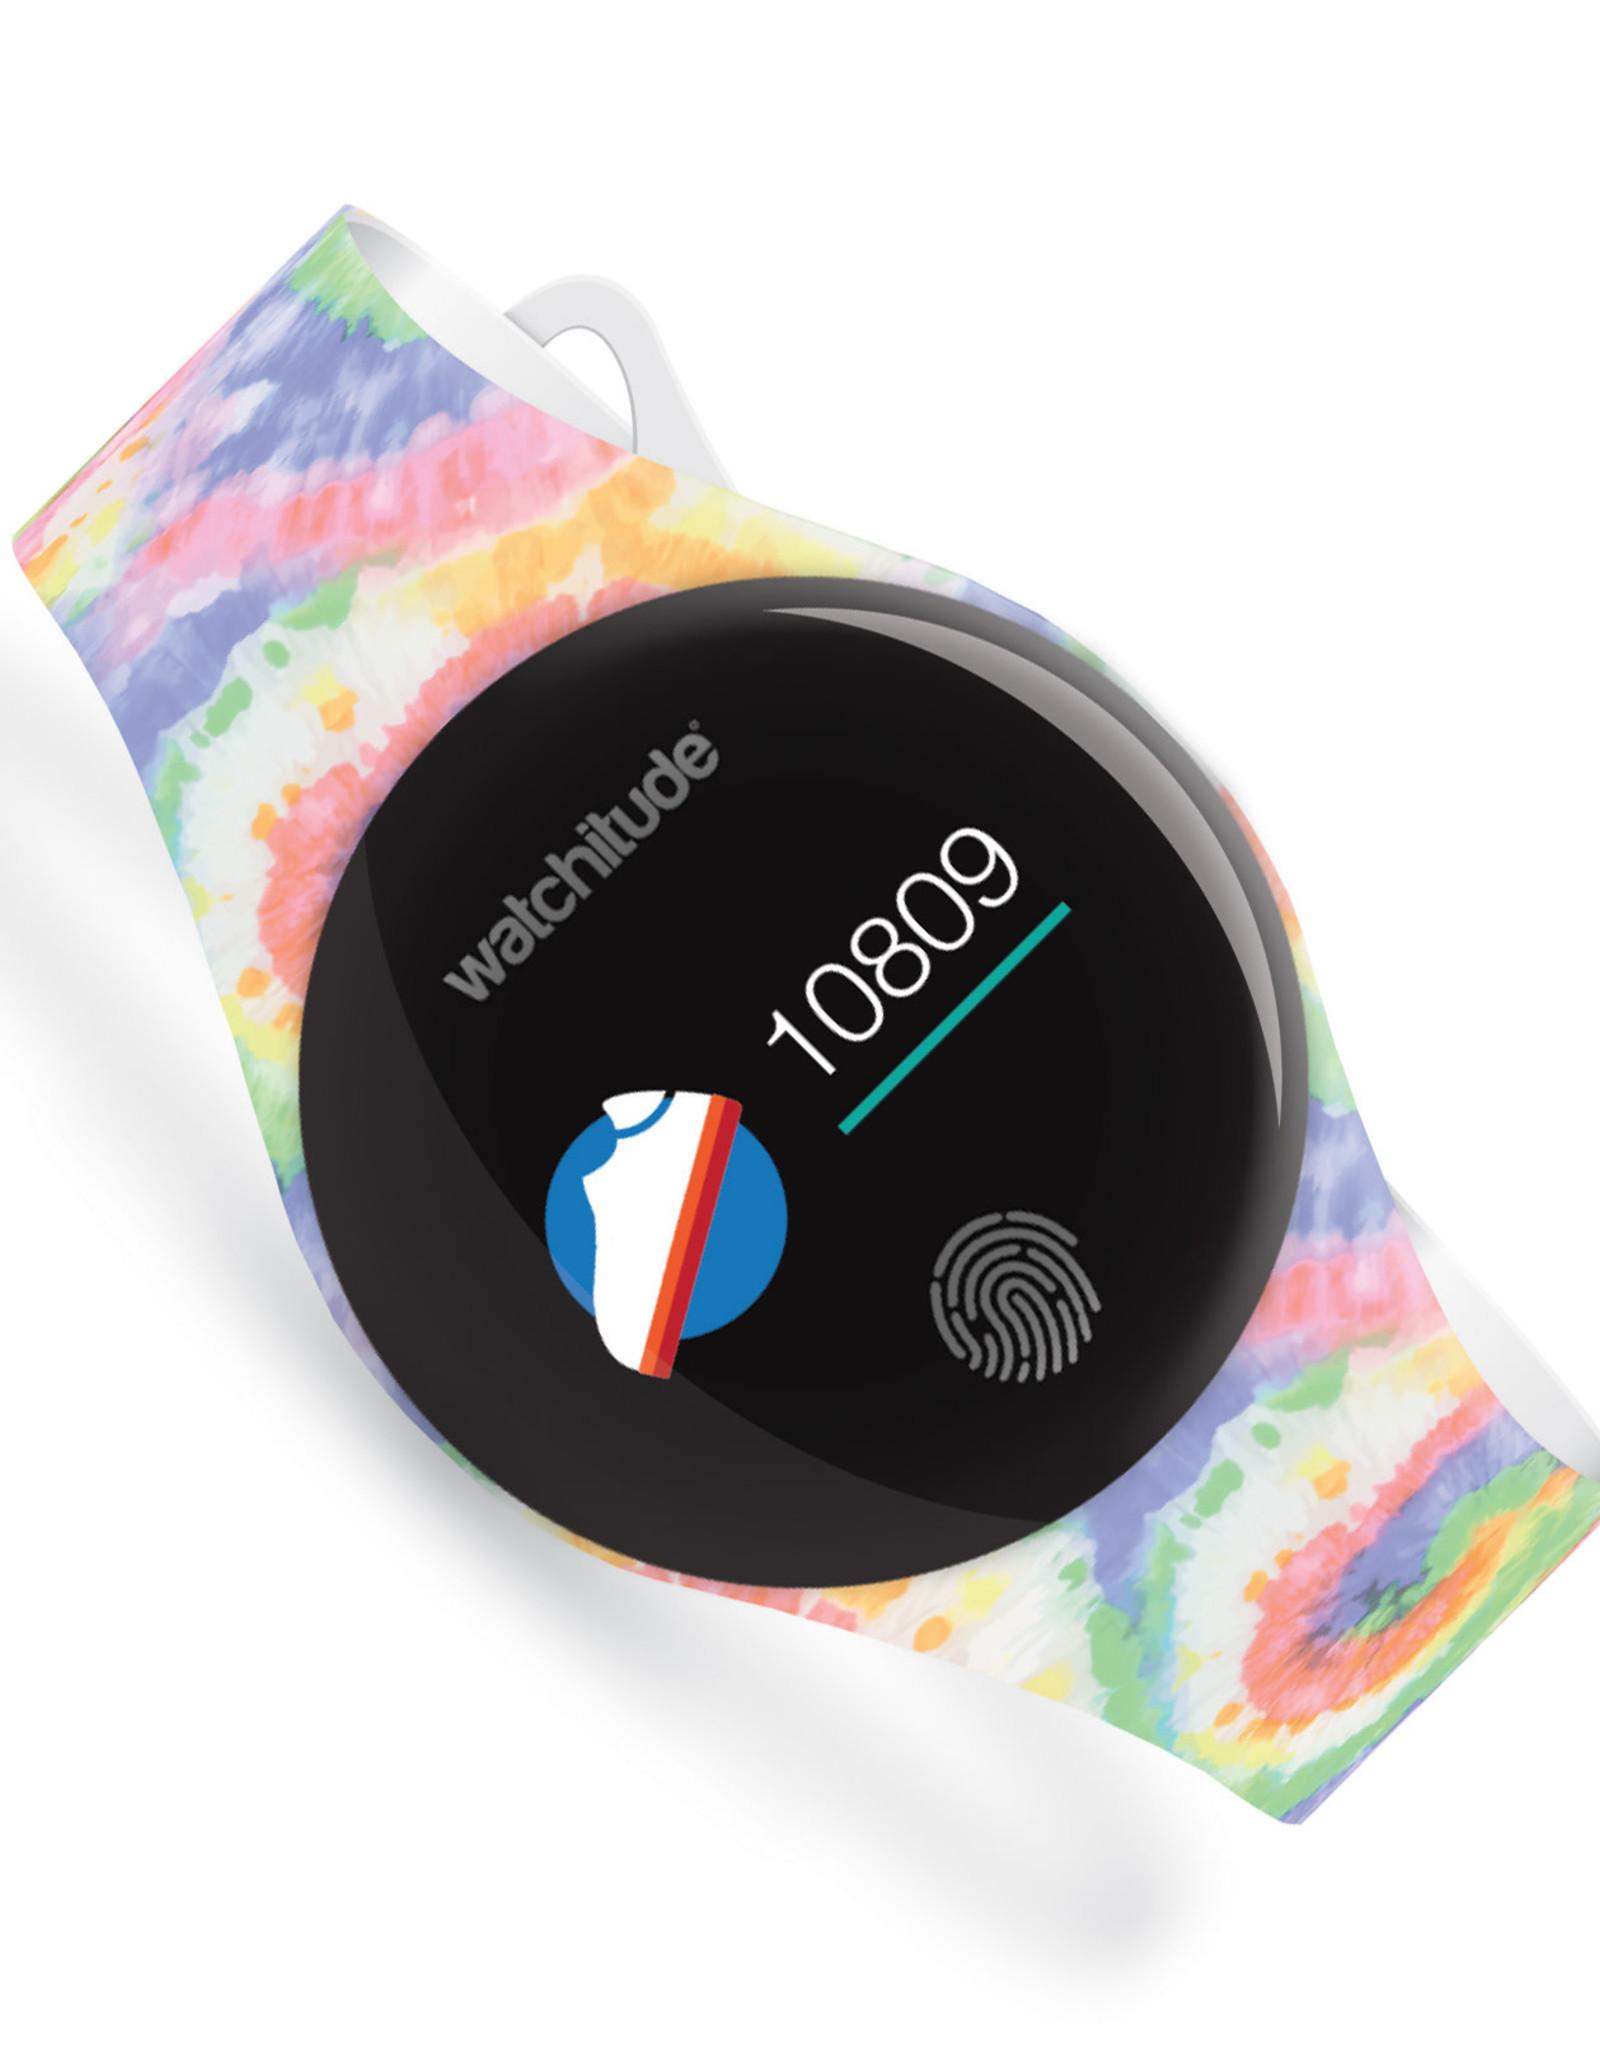 Watchitude Pastel - Move 2 - Kids Activity Plunge Proof Watch